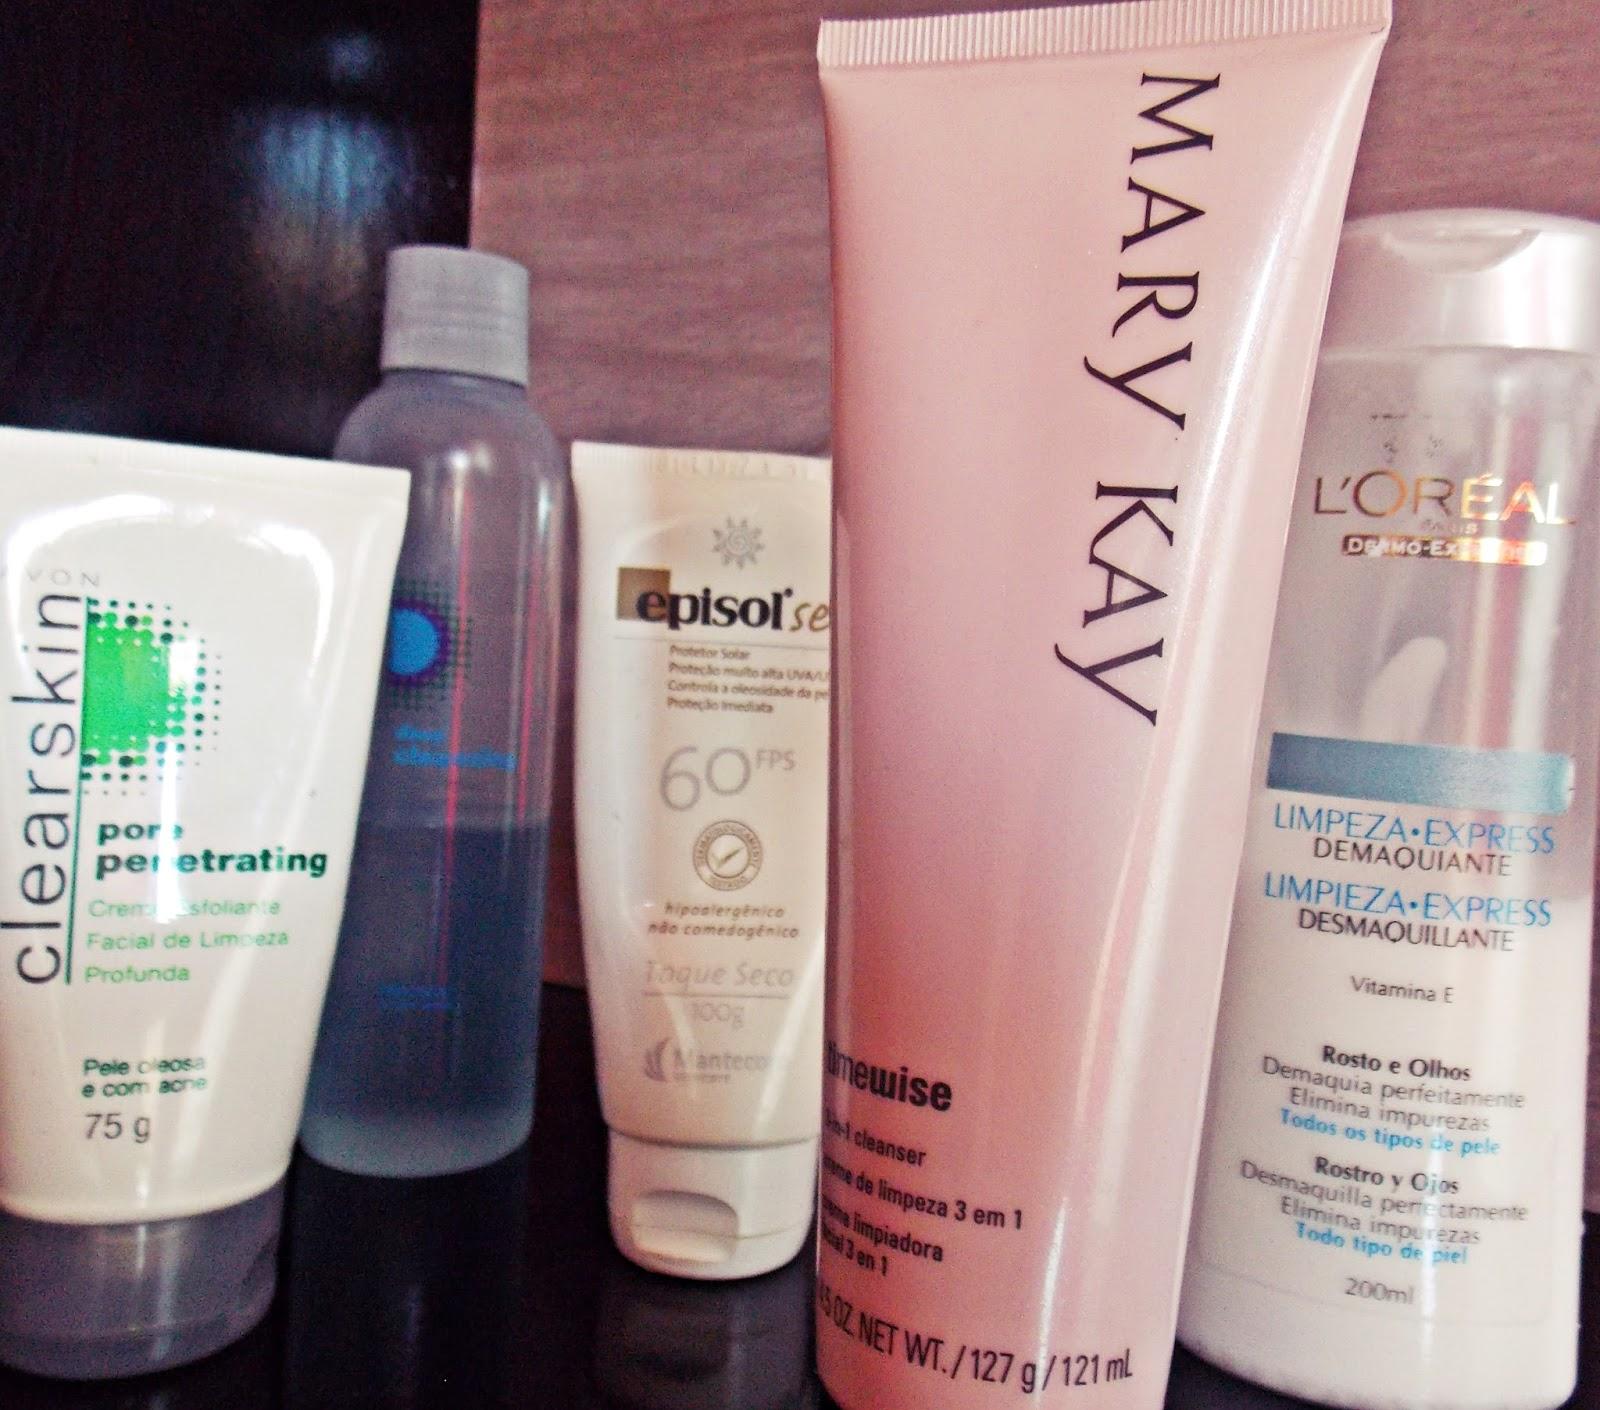 Produtos para limpeza de pele.